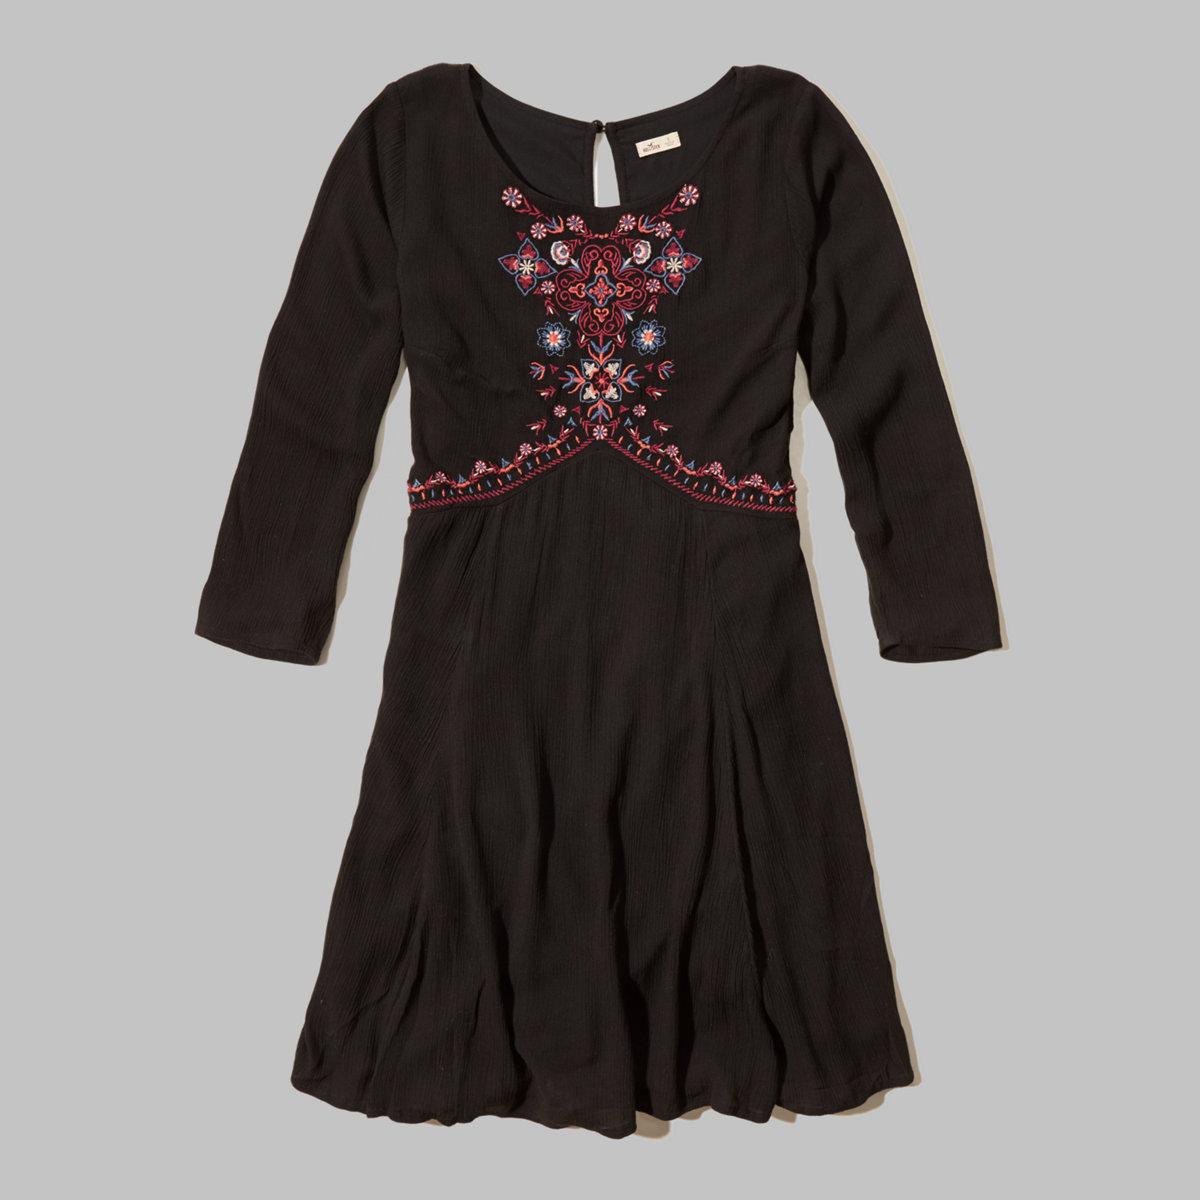 Embroidered Keyhole Dress